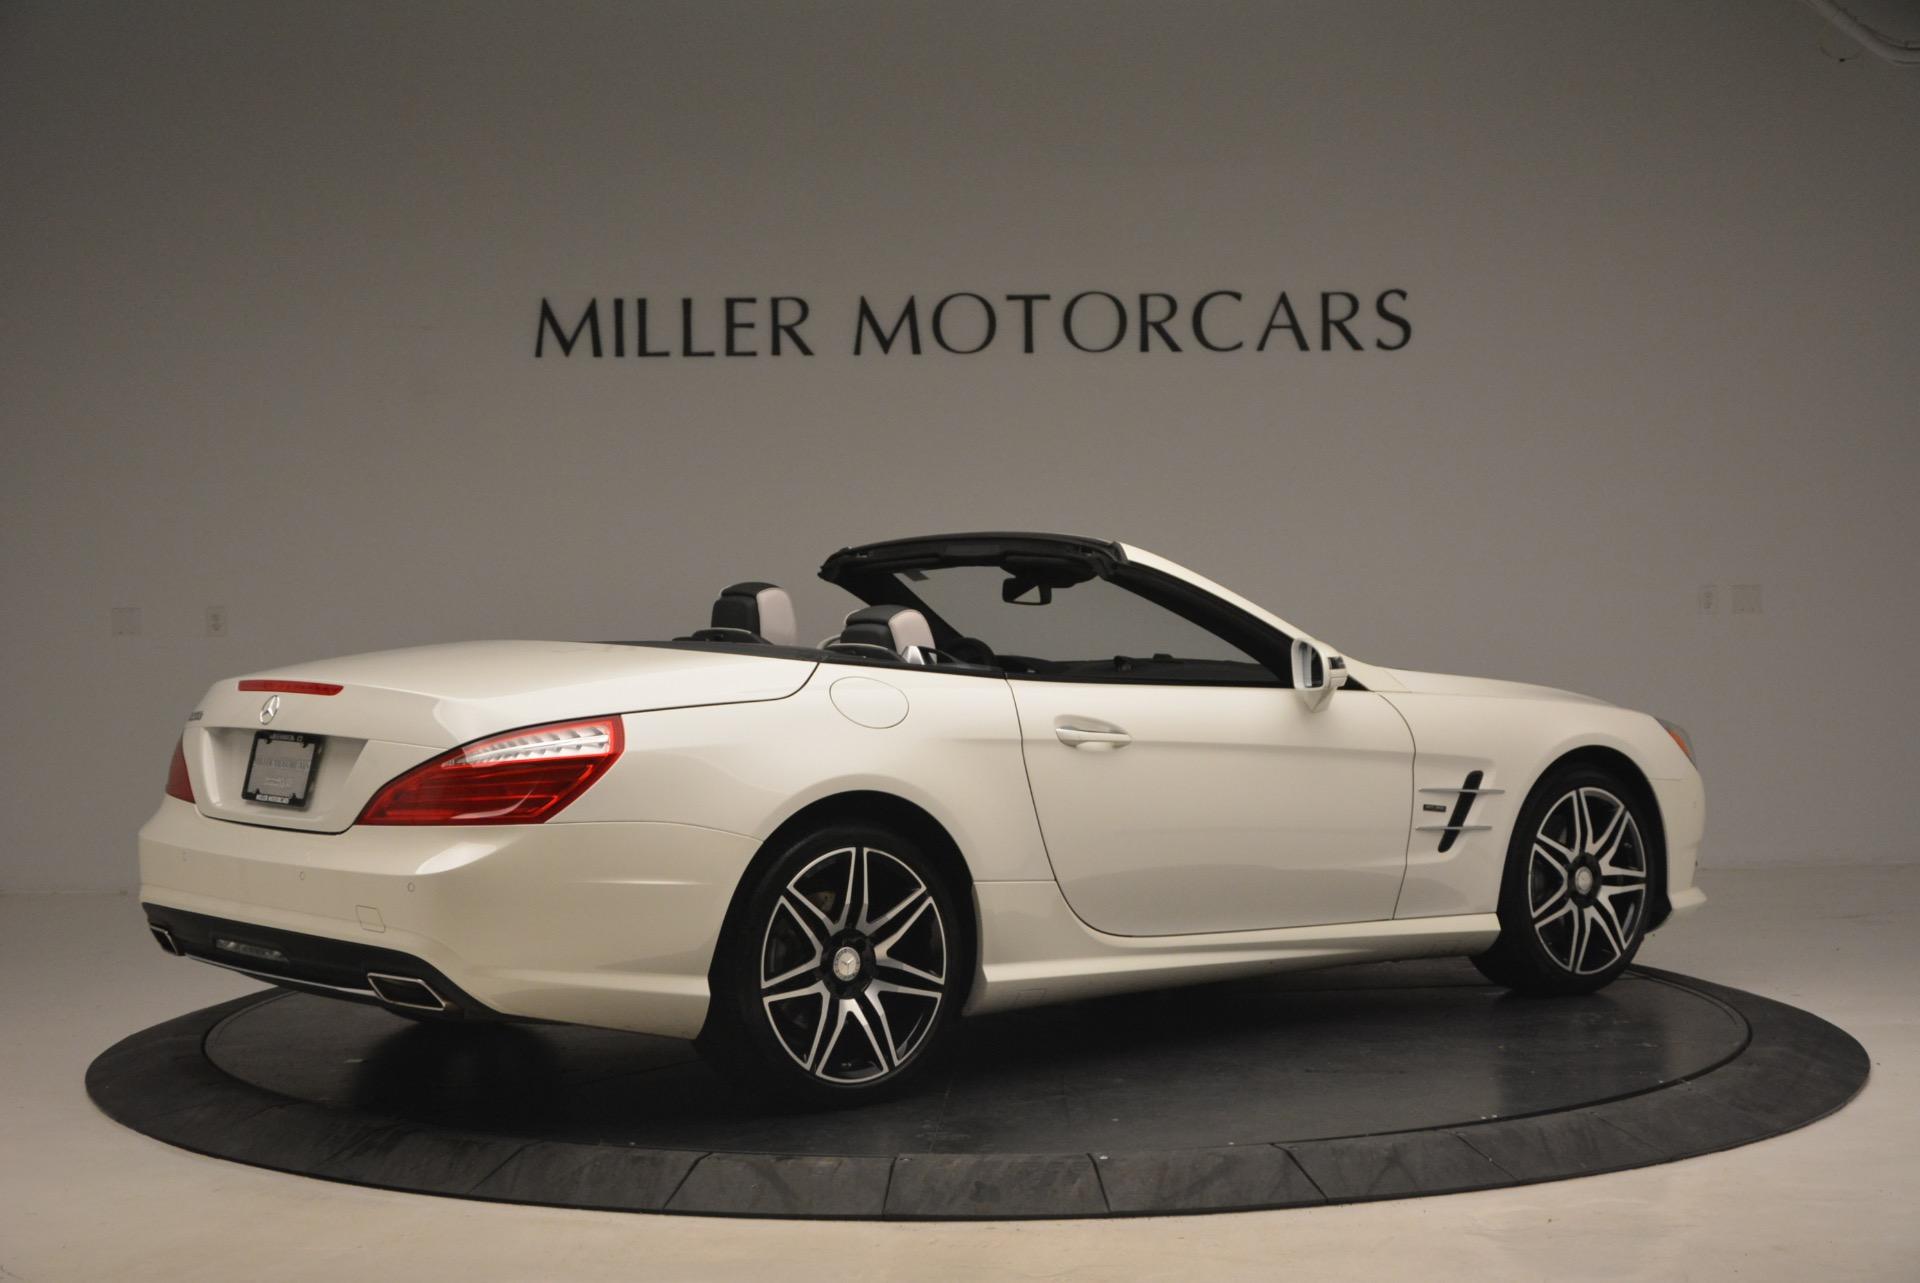 Used 2015 Mercedes Benz SL-Class SL 550 For Sale In Greenwich, CT. Alfa Romeo of Greenwich, M1874A 1261_p8